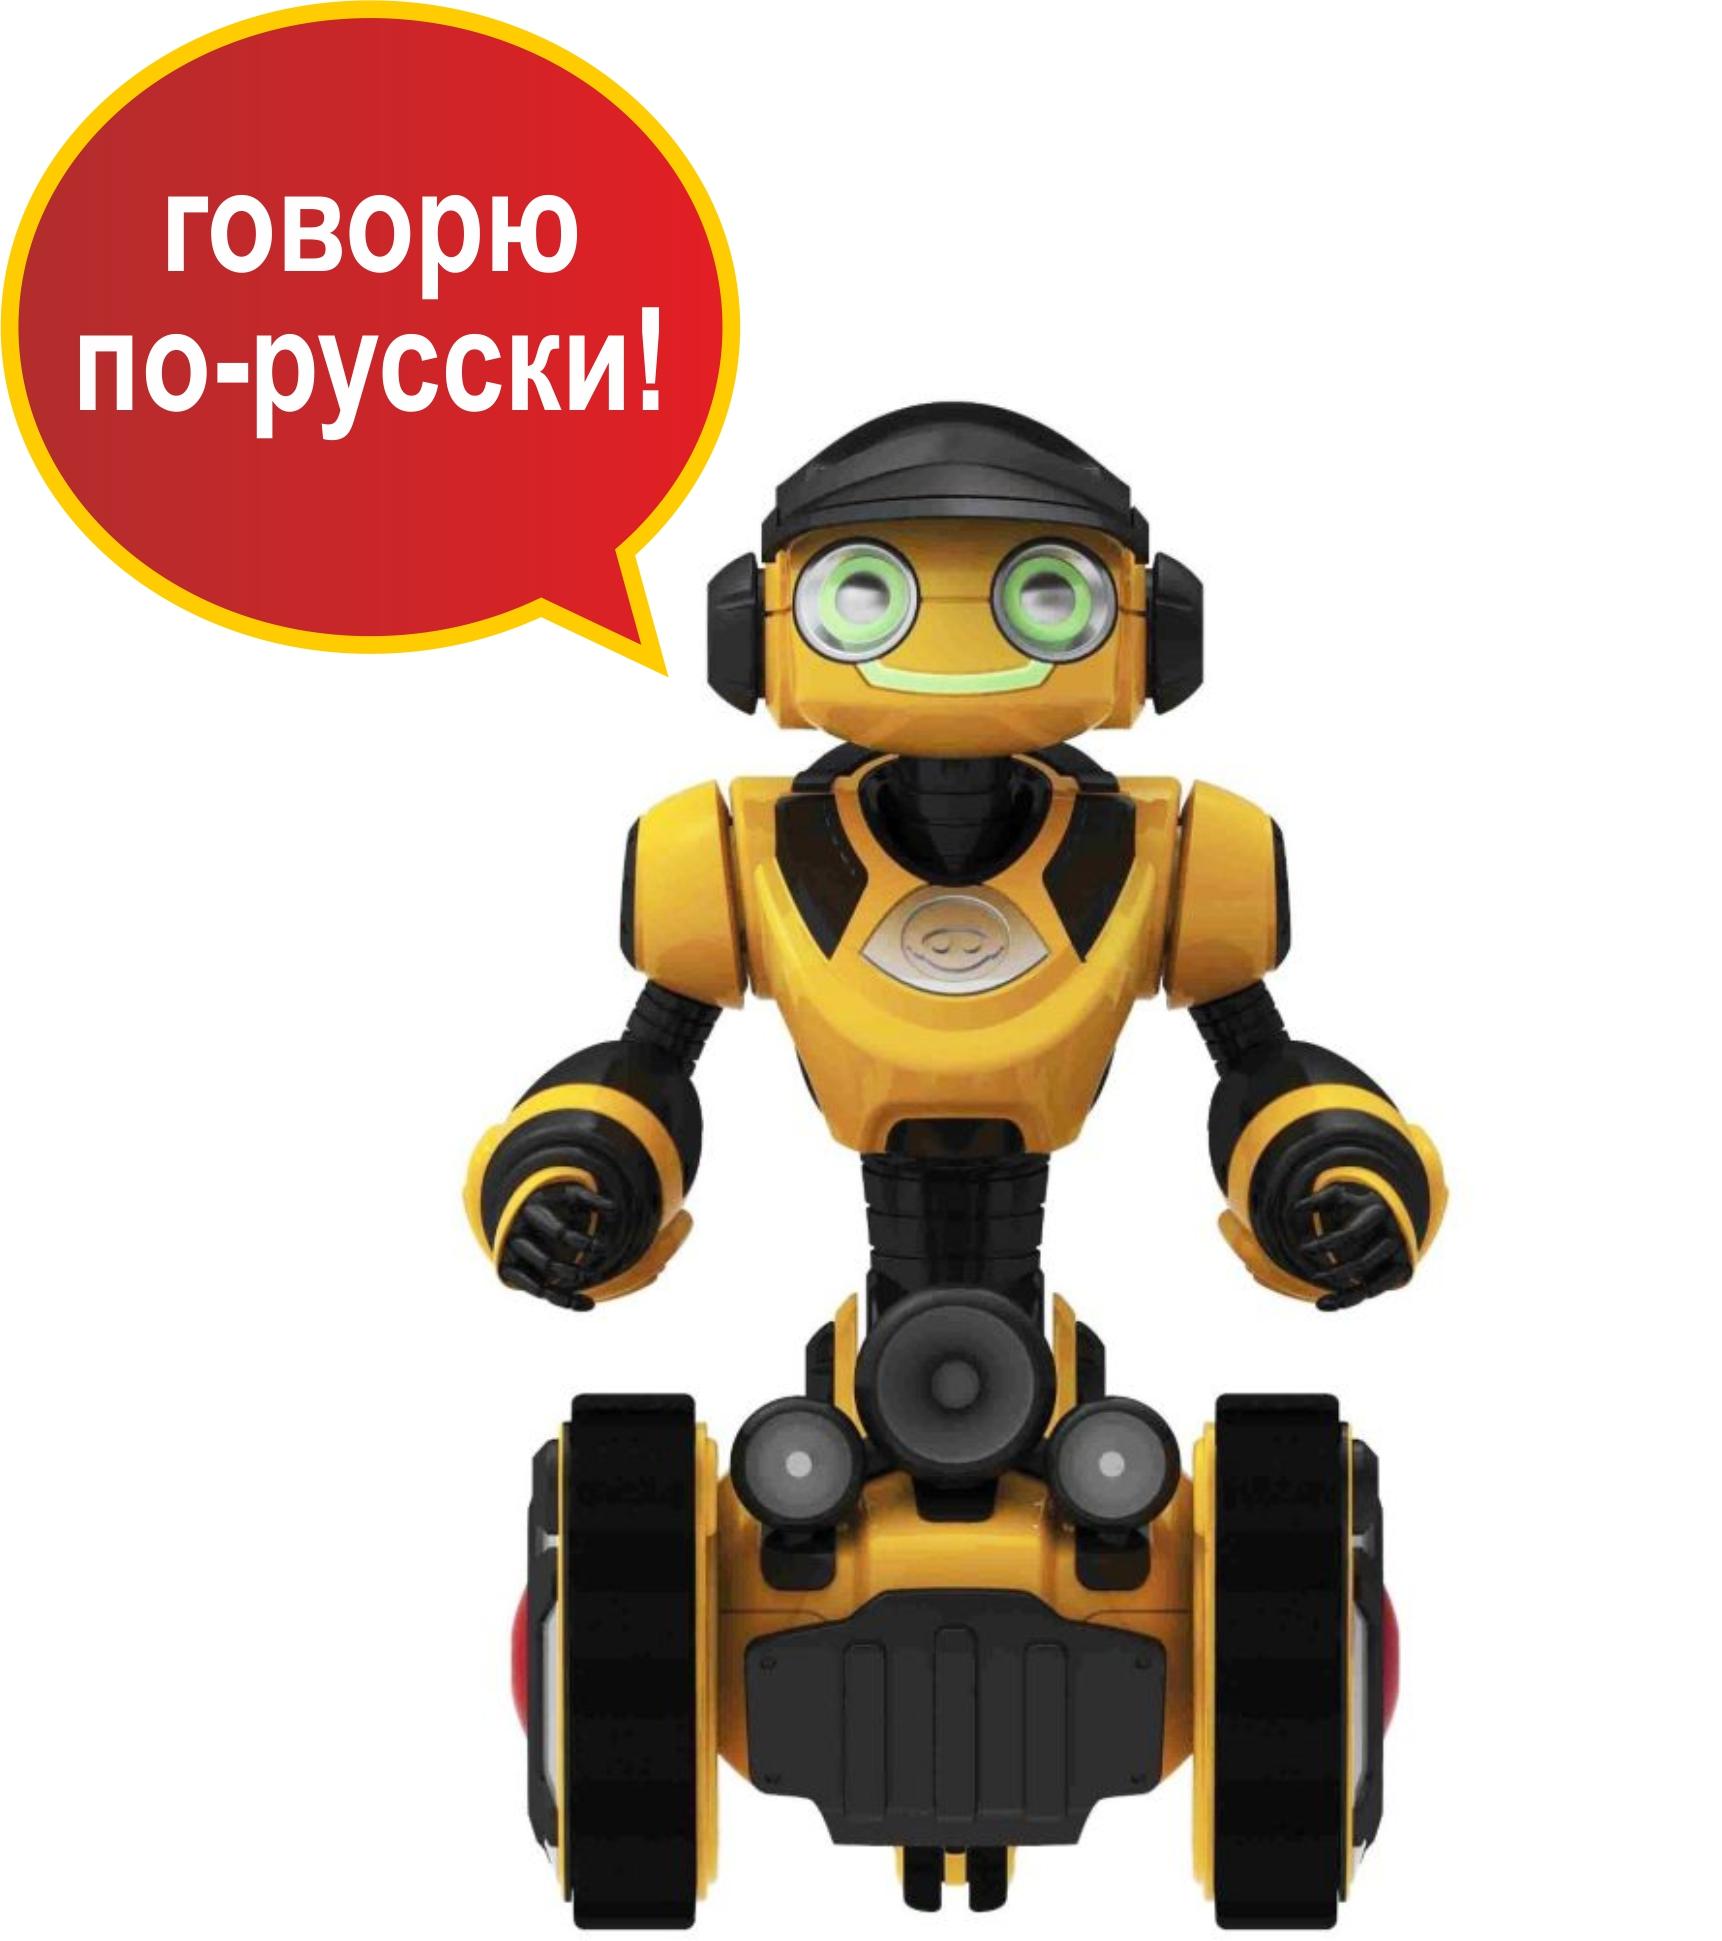 Робот Roborover-3